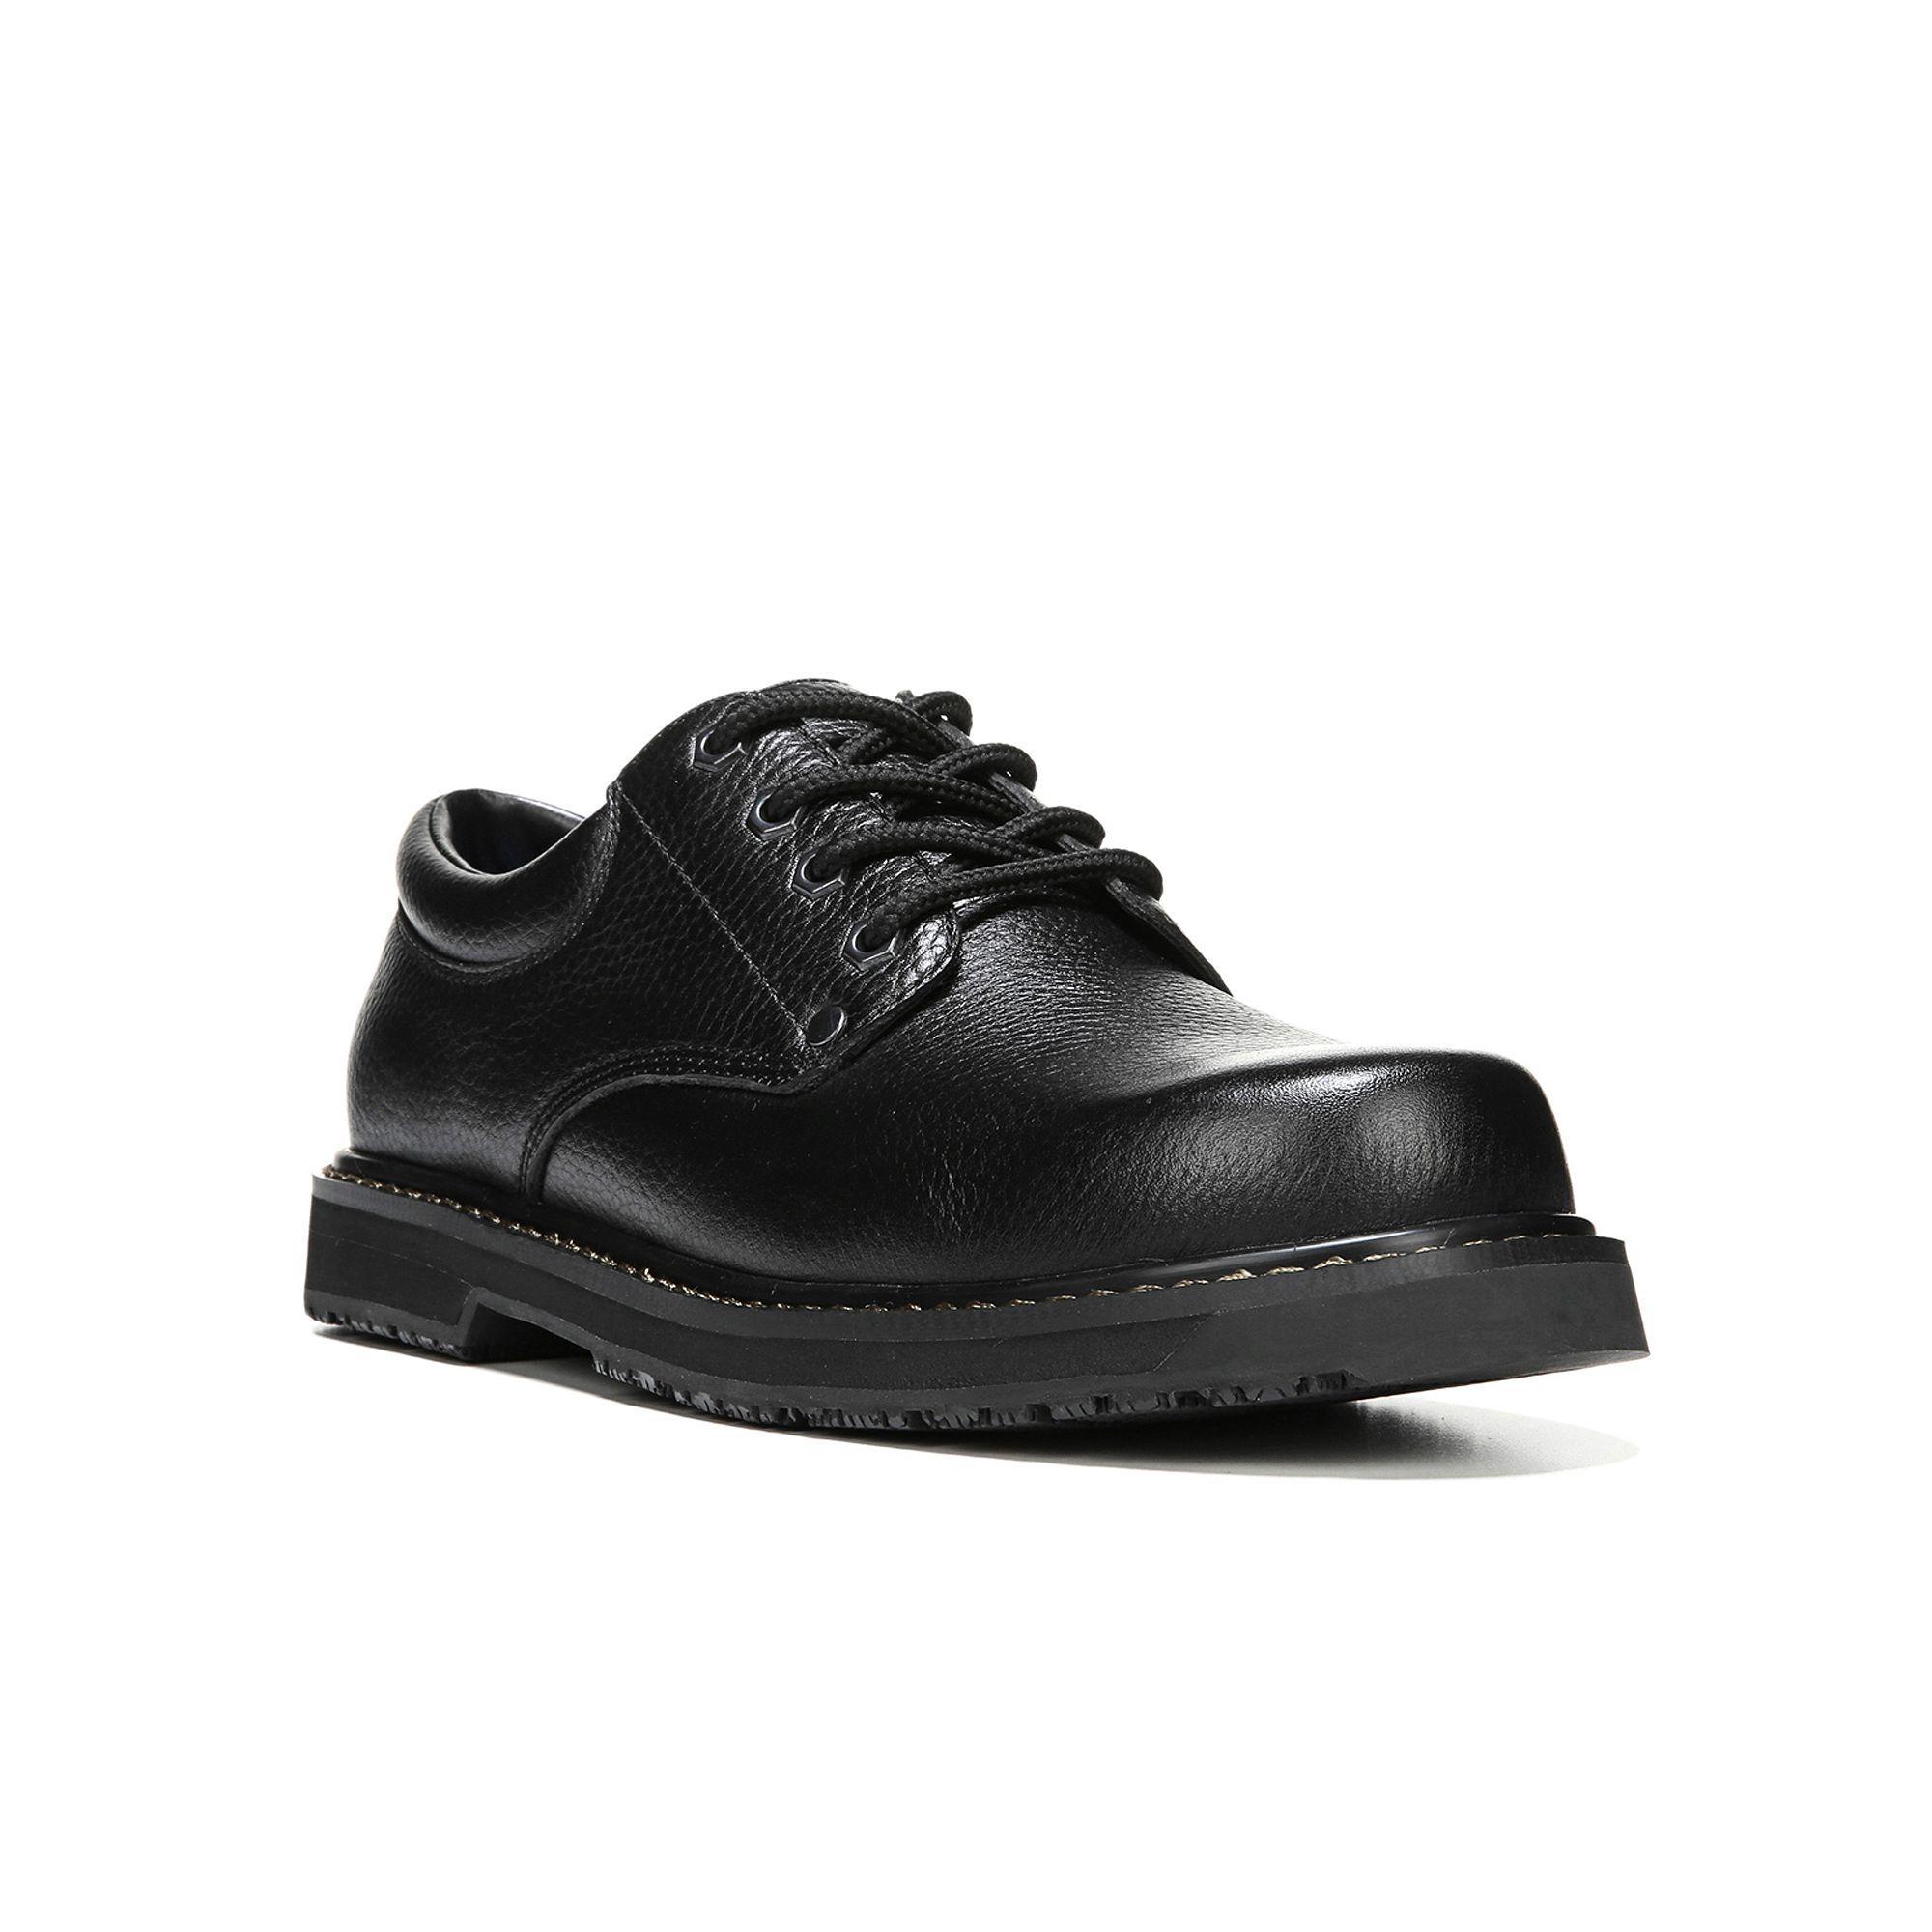 Dr. Scholl's Harrington II Men's Work Shoes, Size: medium (7.5), Black, Durable